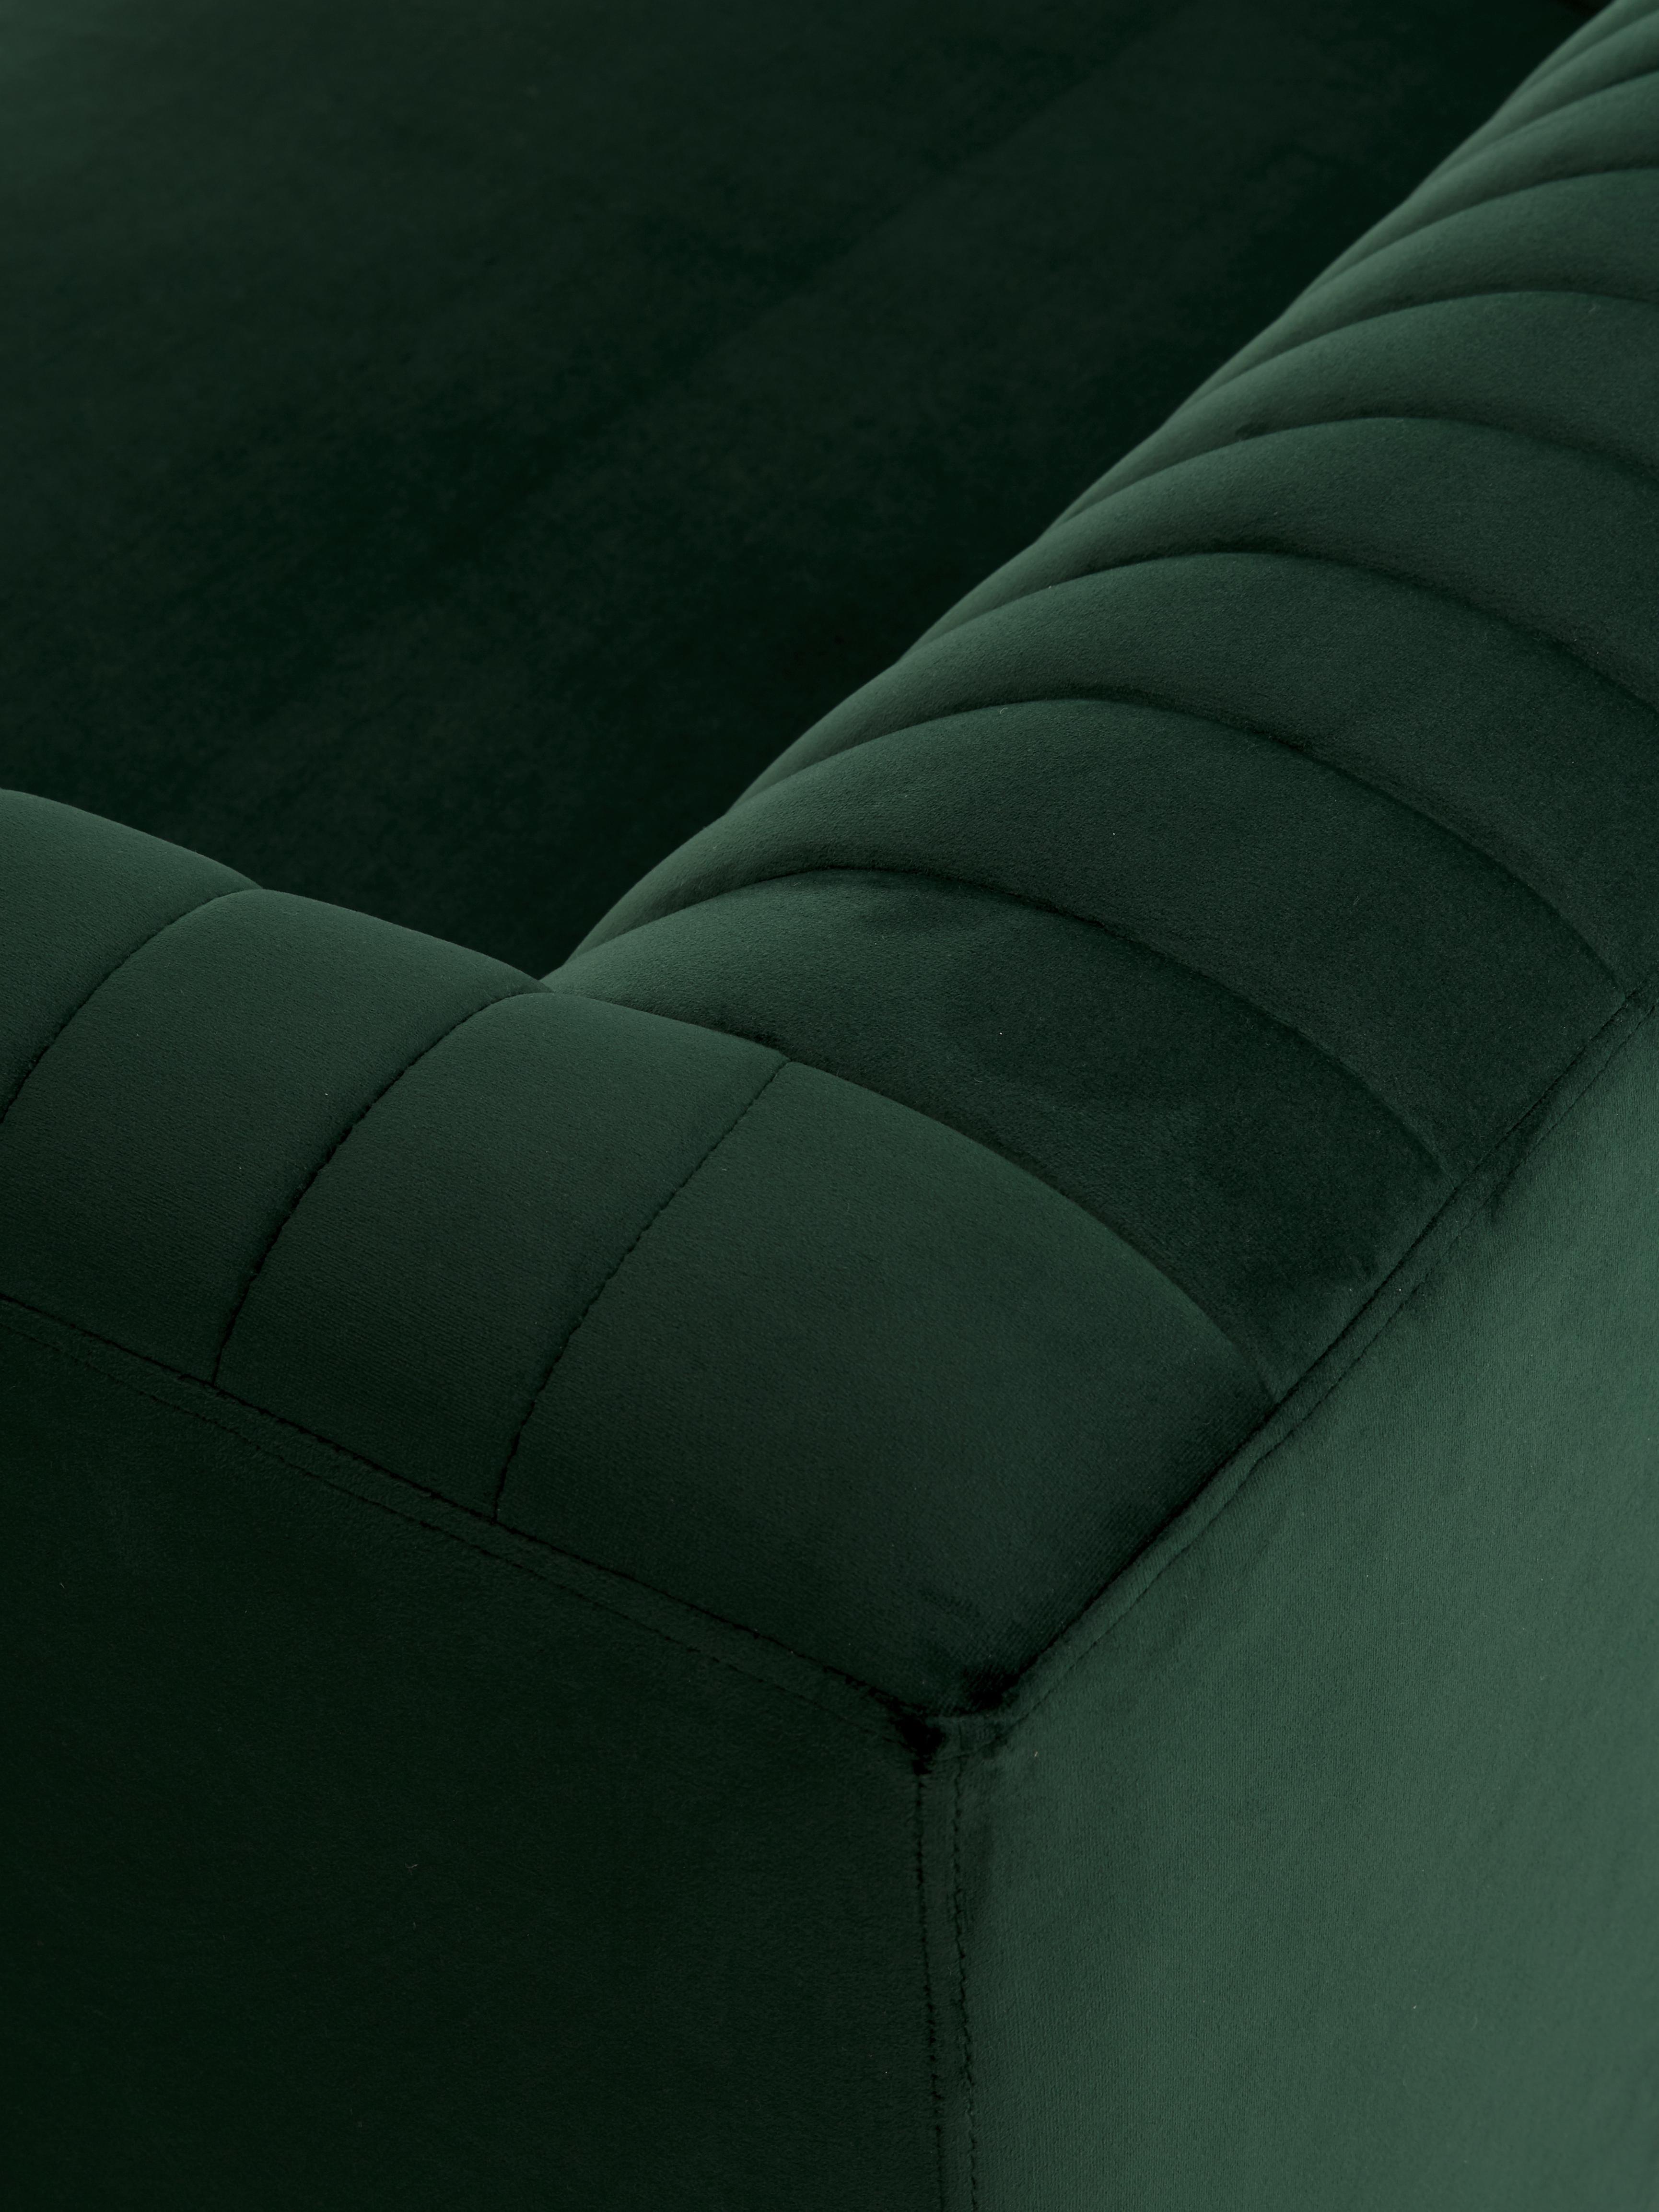 Samt-Sofa Dante (3-Sitzer), Bezug: Polyestersamt, Gestell: Kautschukbaumholz, klarla, Samt Grün, B 210 x T 87 cm